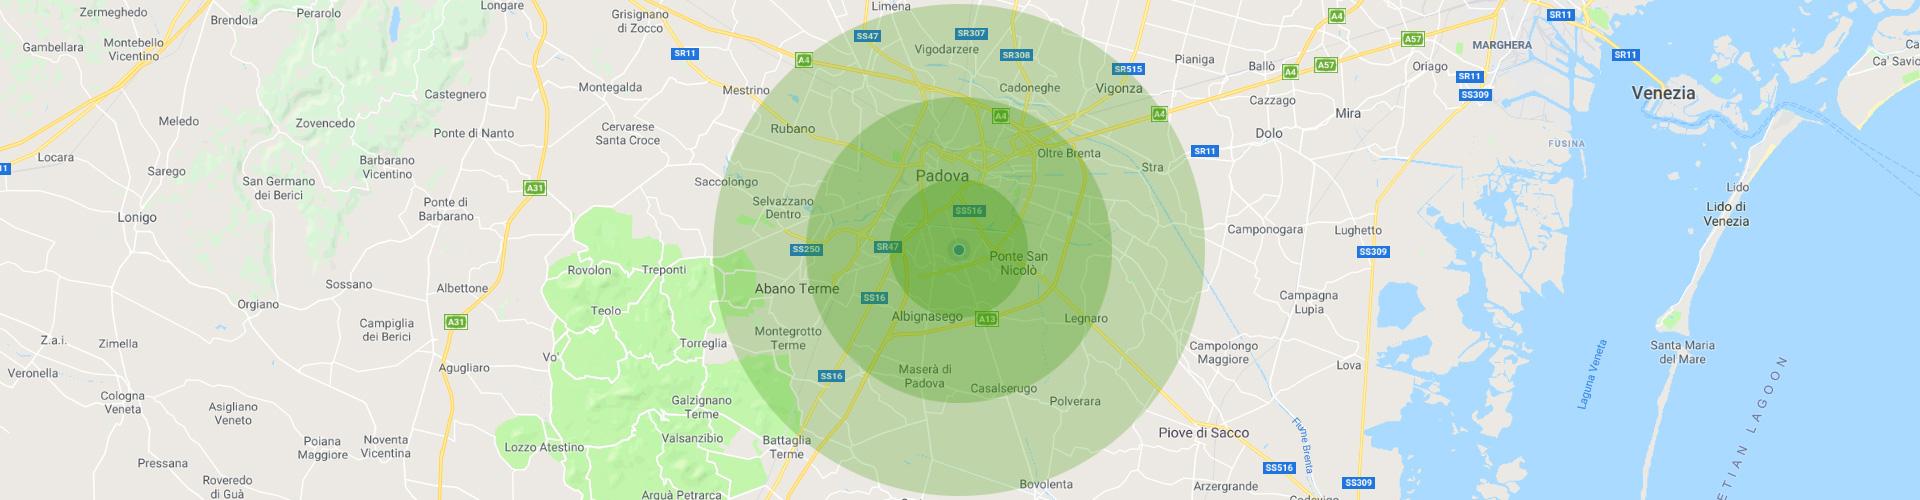 Mappa-google